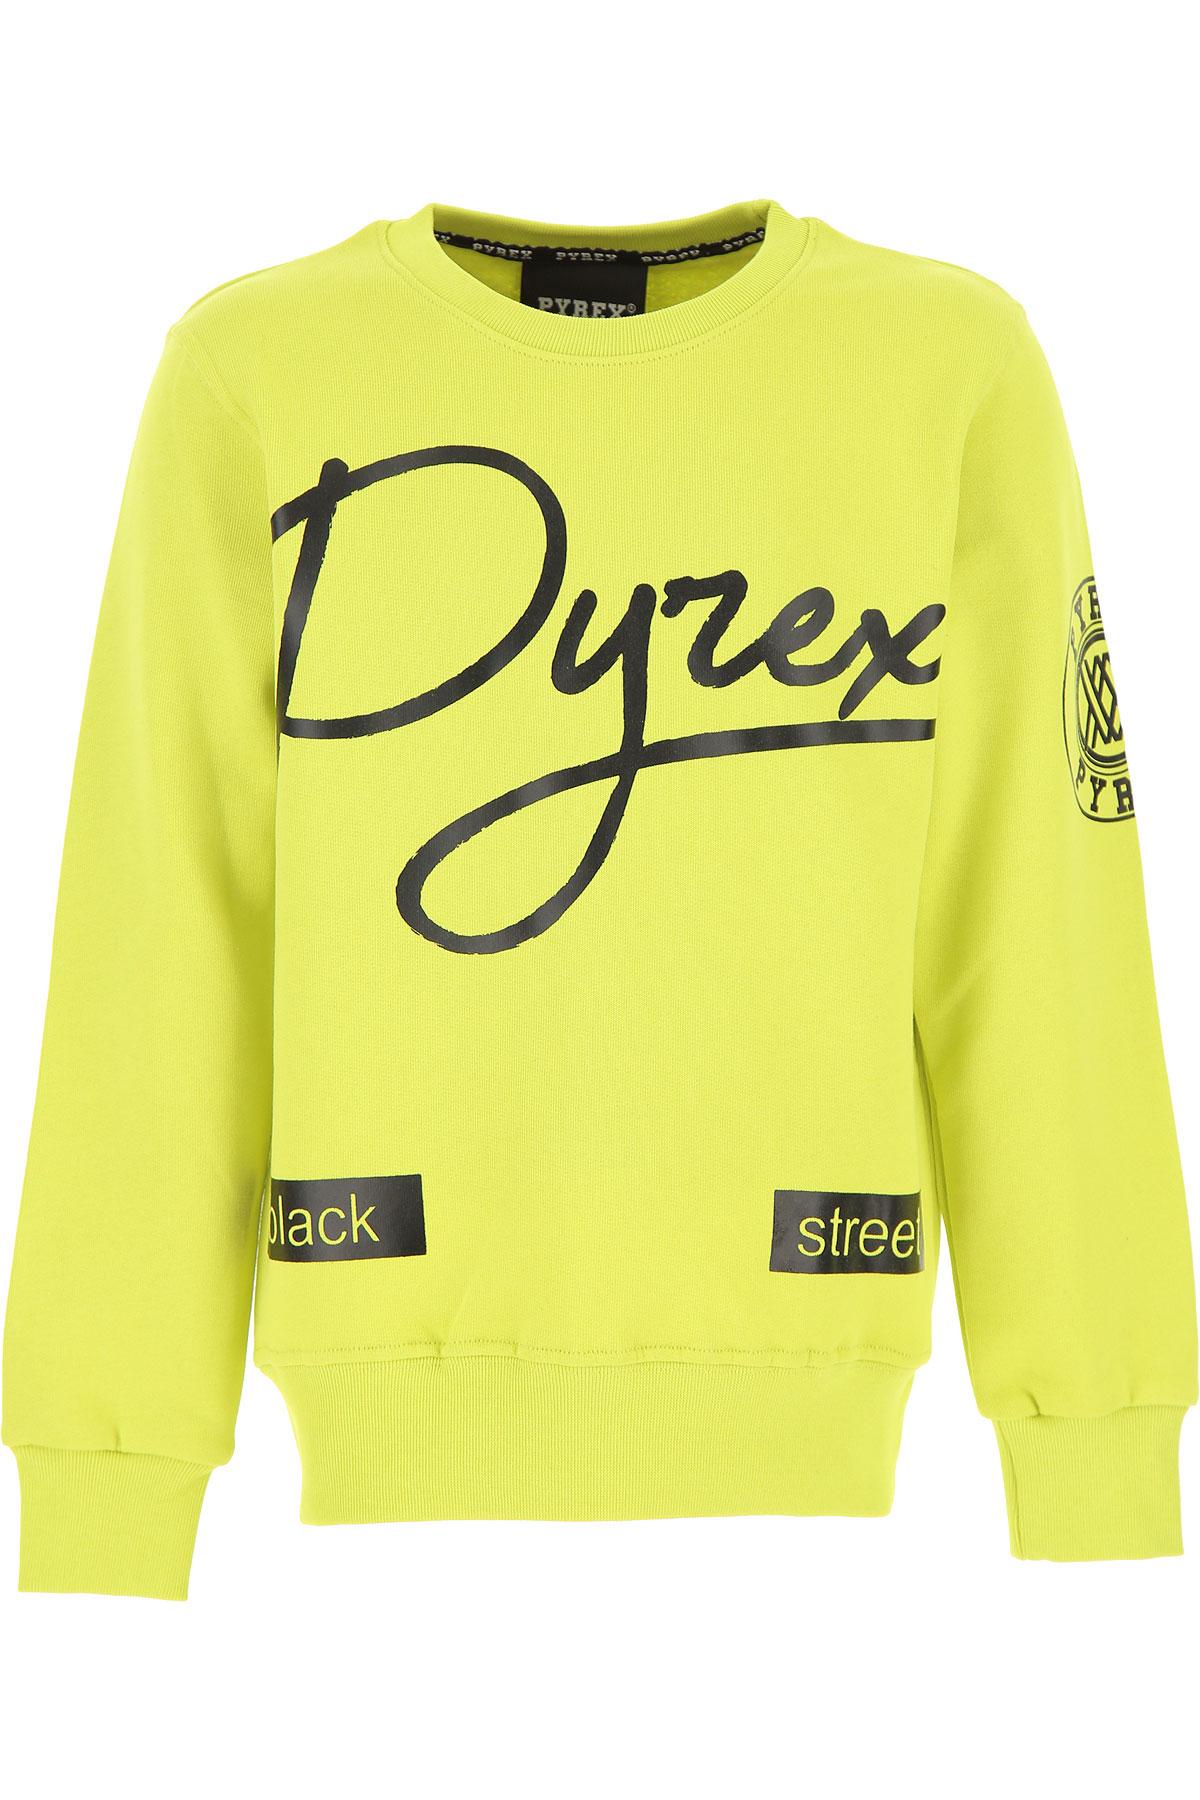 Pyrex Kids Sweatshirts & Hoodies for Boys On Sale, Lime, Cotton, 2019, M S XL XS XXL (16 Y)